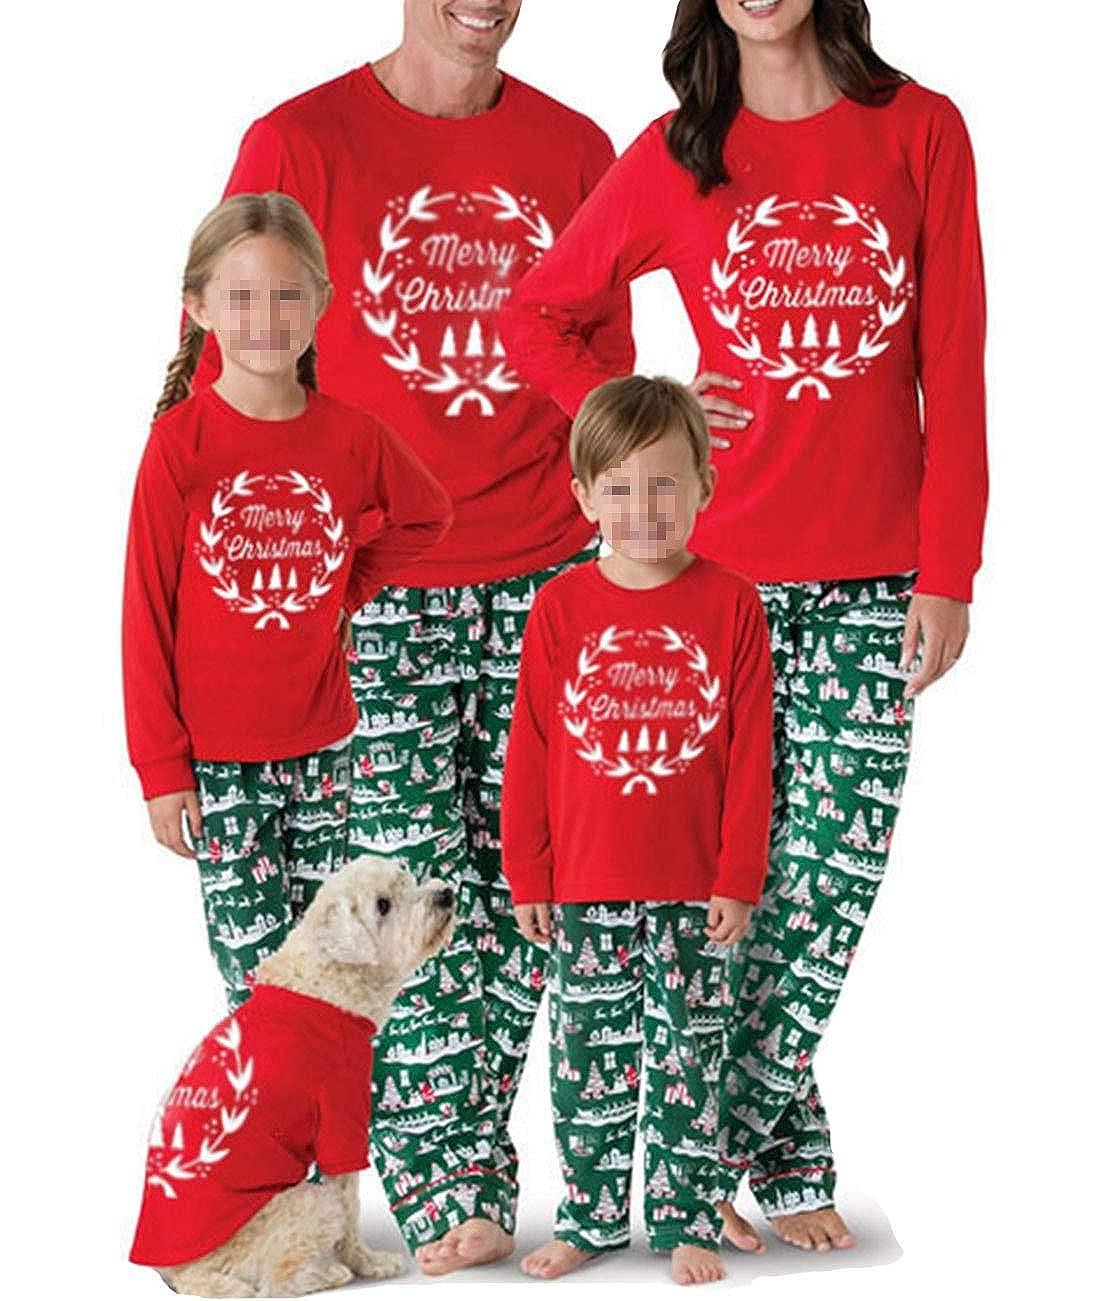 Merry Christmas Family Matching Pajamas Sets Top Santa Claus Tree Pant Christmas Pj for Family